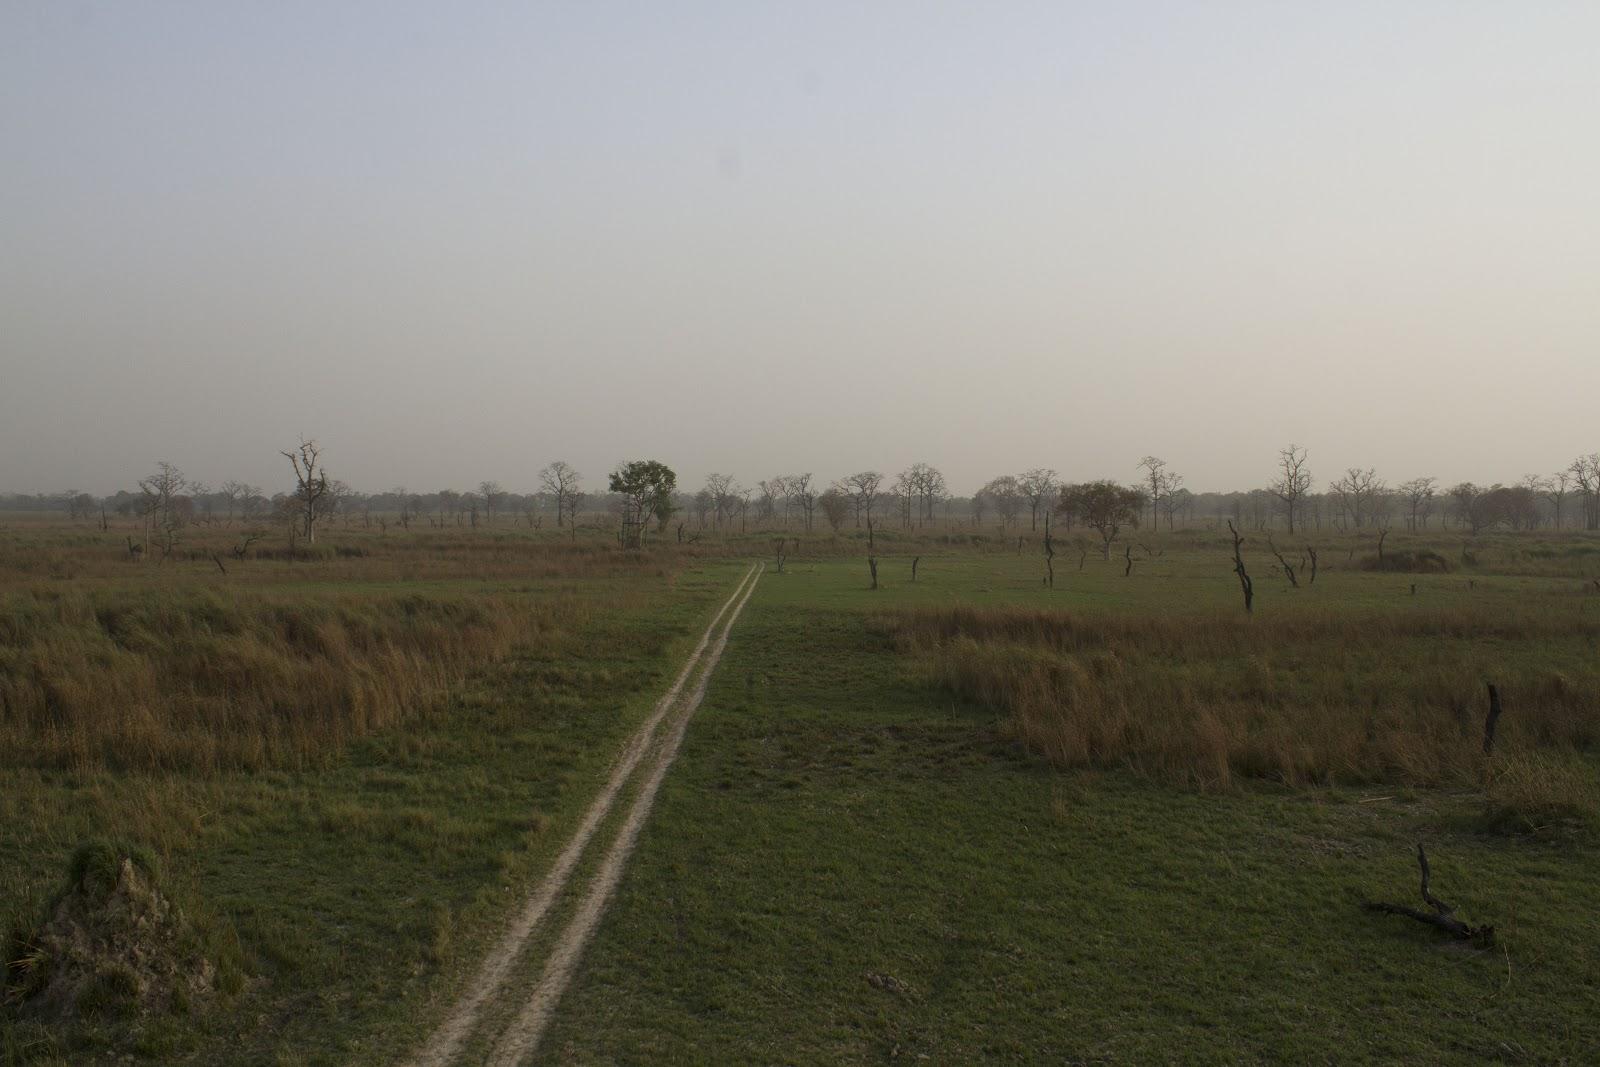 dudhwa+Landscape+4.JPG